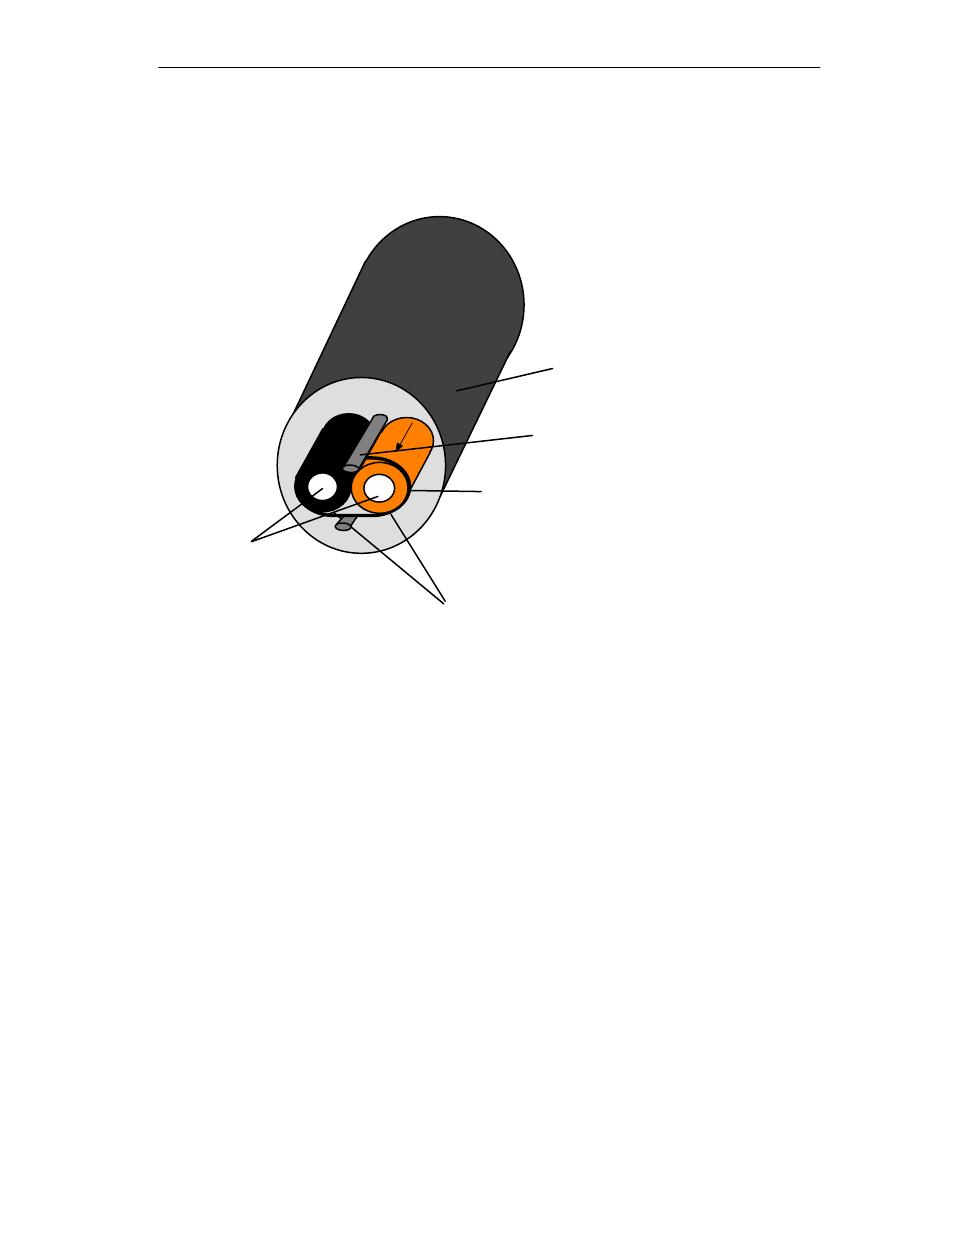 medium resolution of 2 plastic fiber optic standard cables siemens simatic net profibus user manual page 203 490